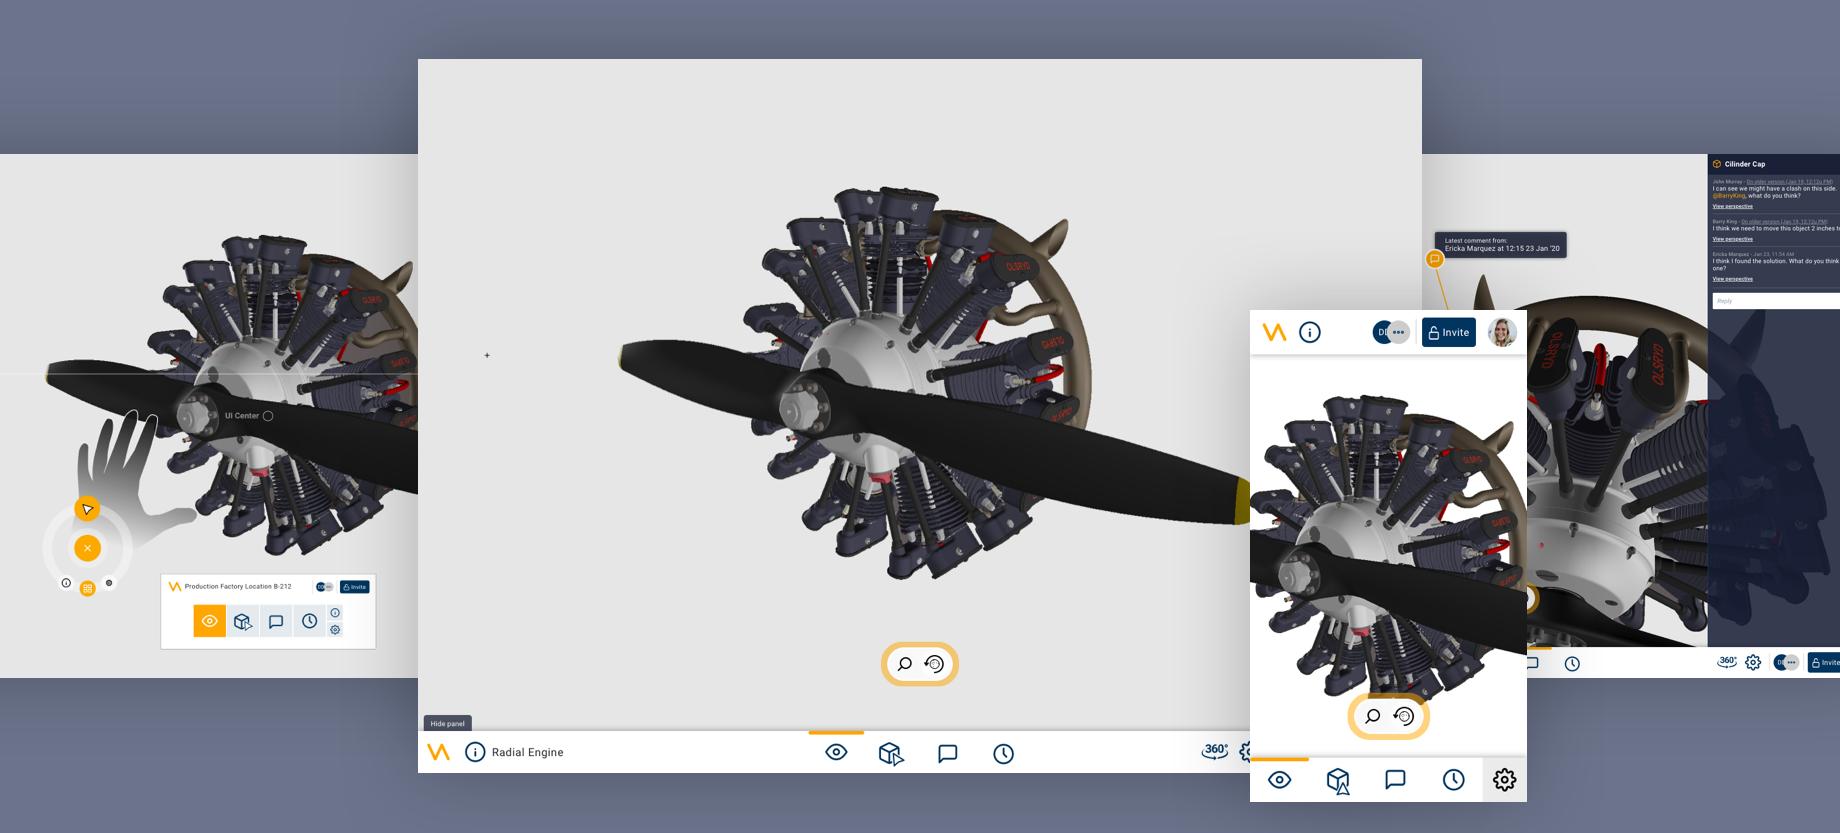 Design snapshots of the Virtalis XR Webplatform